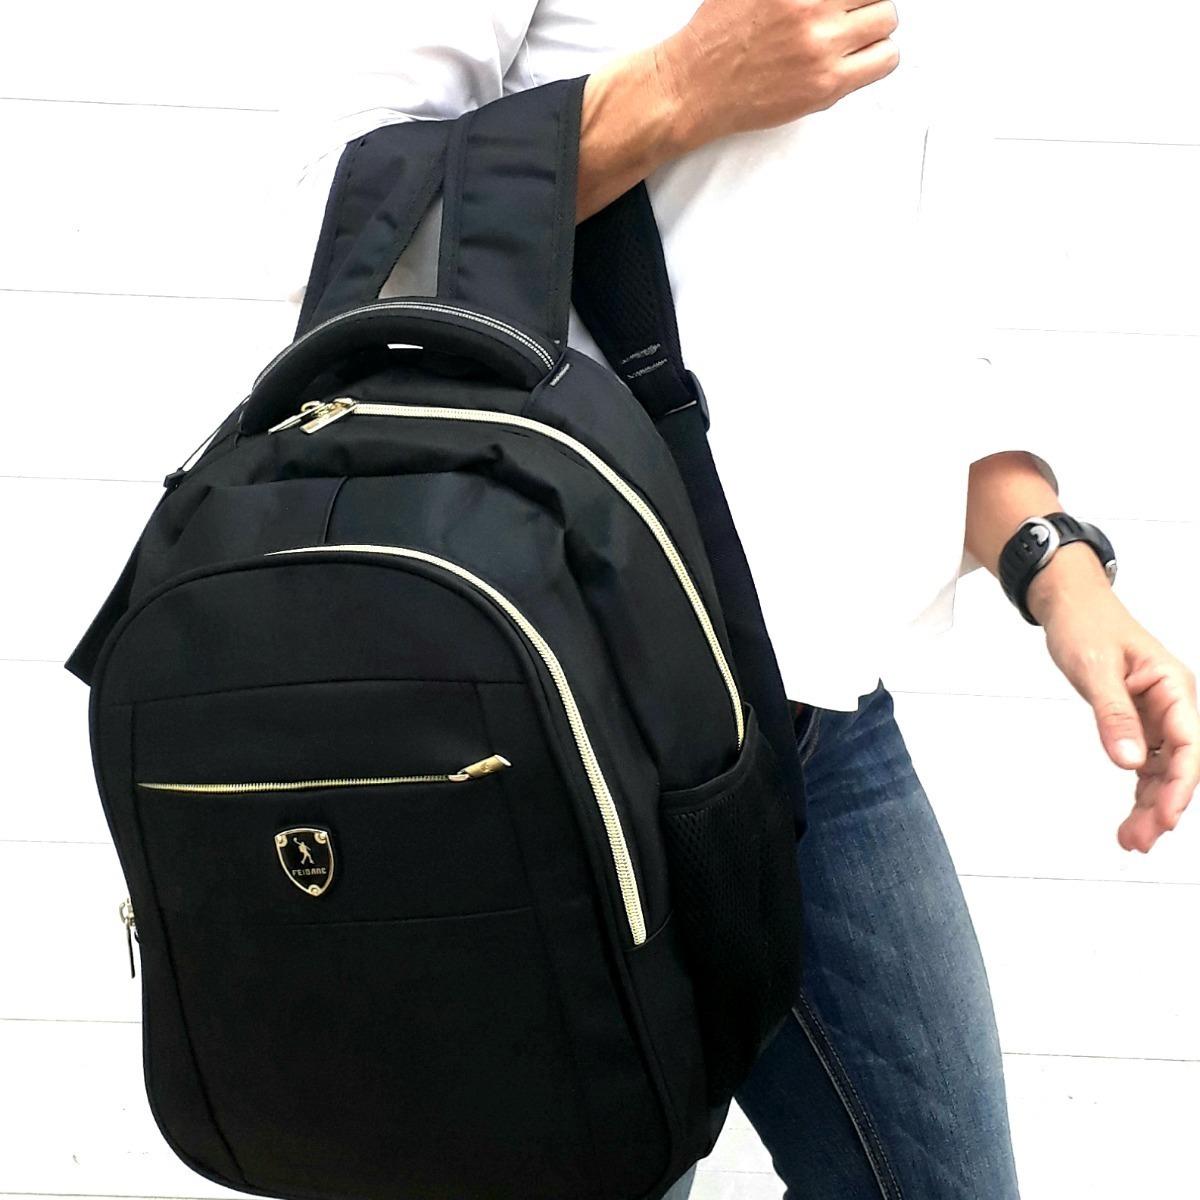 72f398636 kit 10 mochilas atacado revenda bolsa feminina universitária. Carregando  zoom.